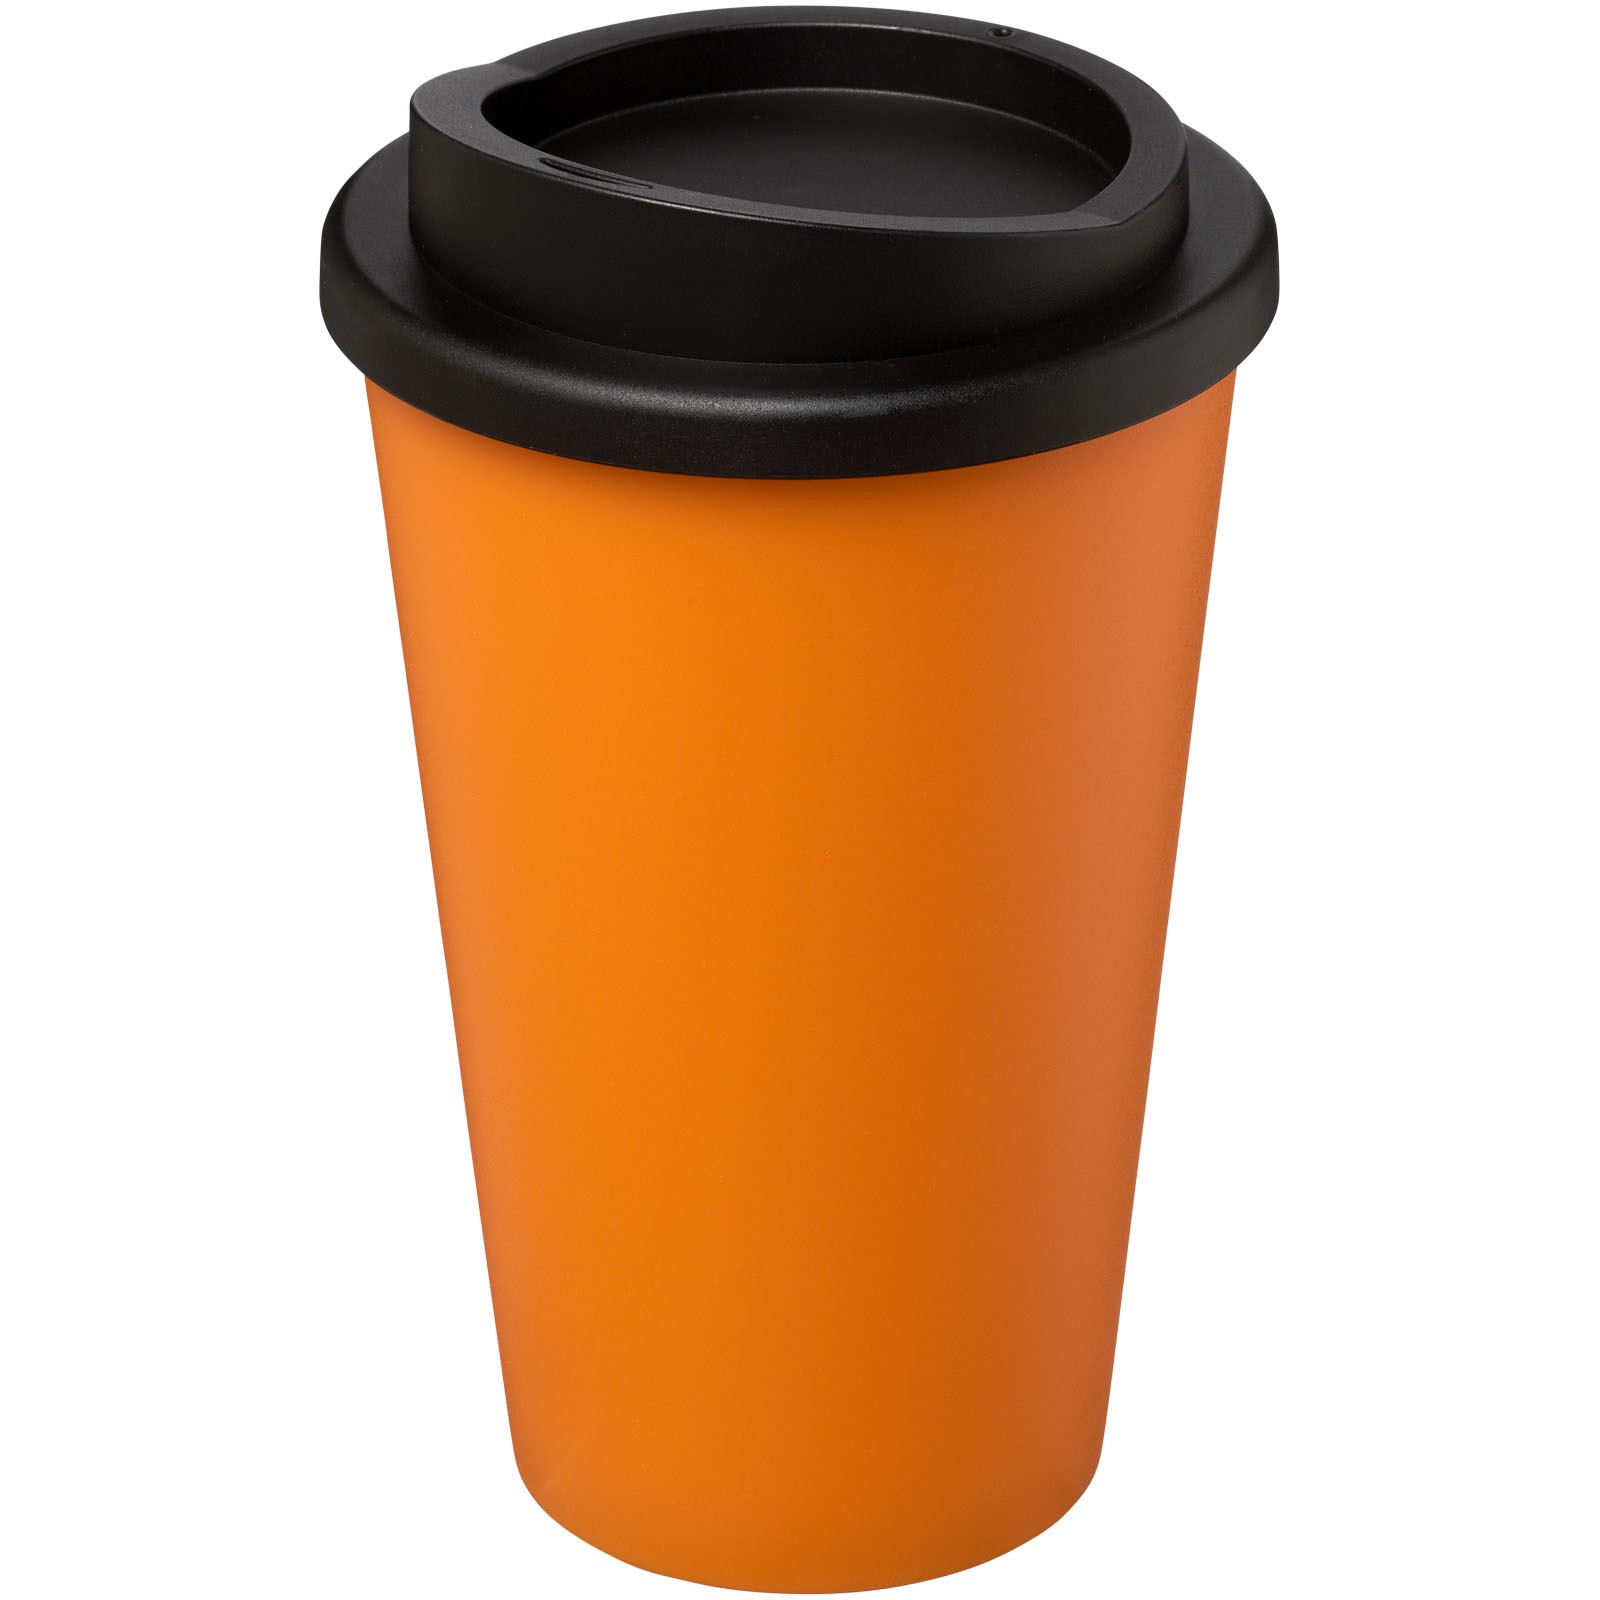 Americano® Vaso térmico de 350 ml - Naranja / Negro intenso